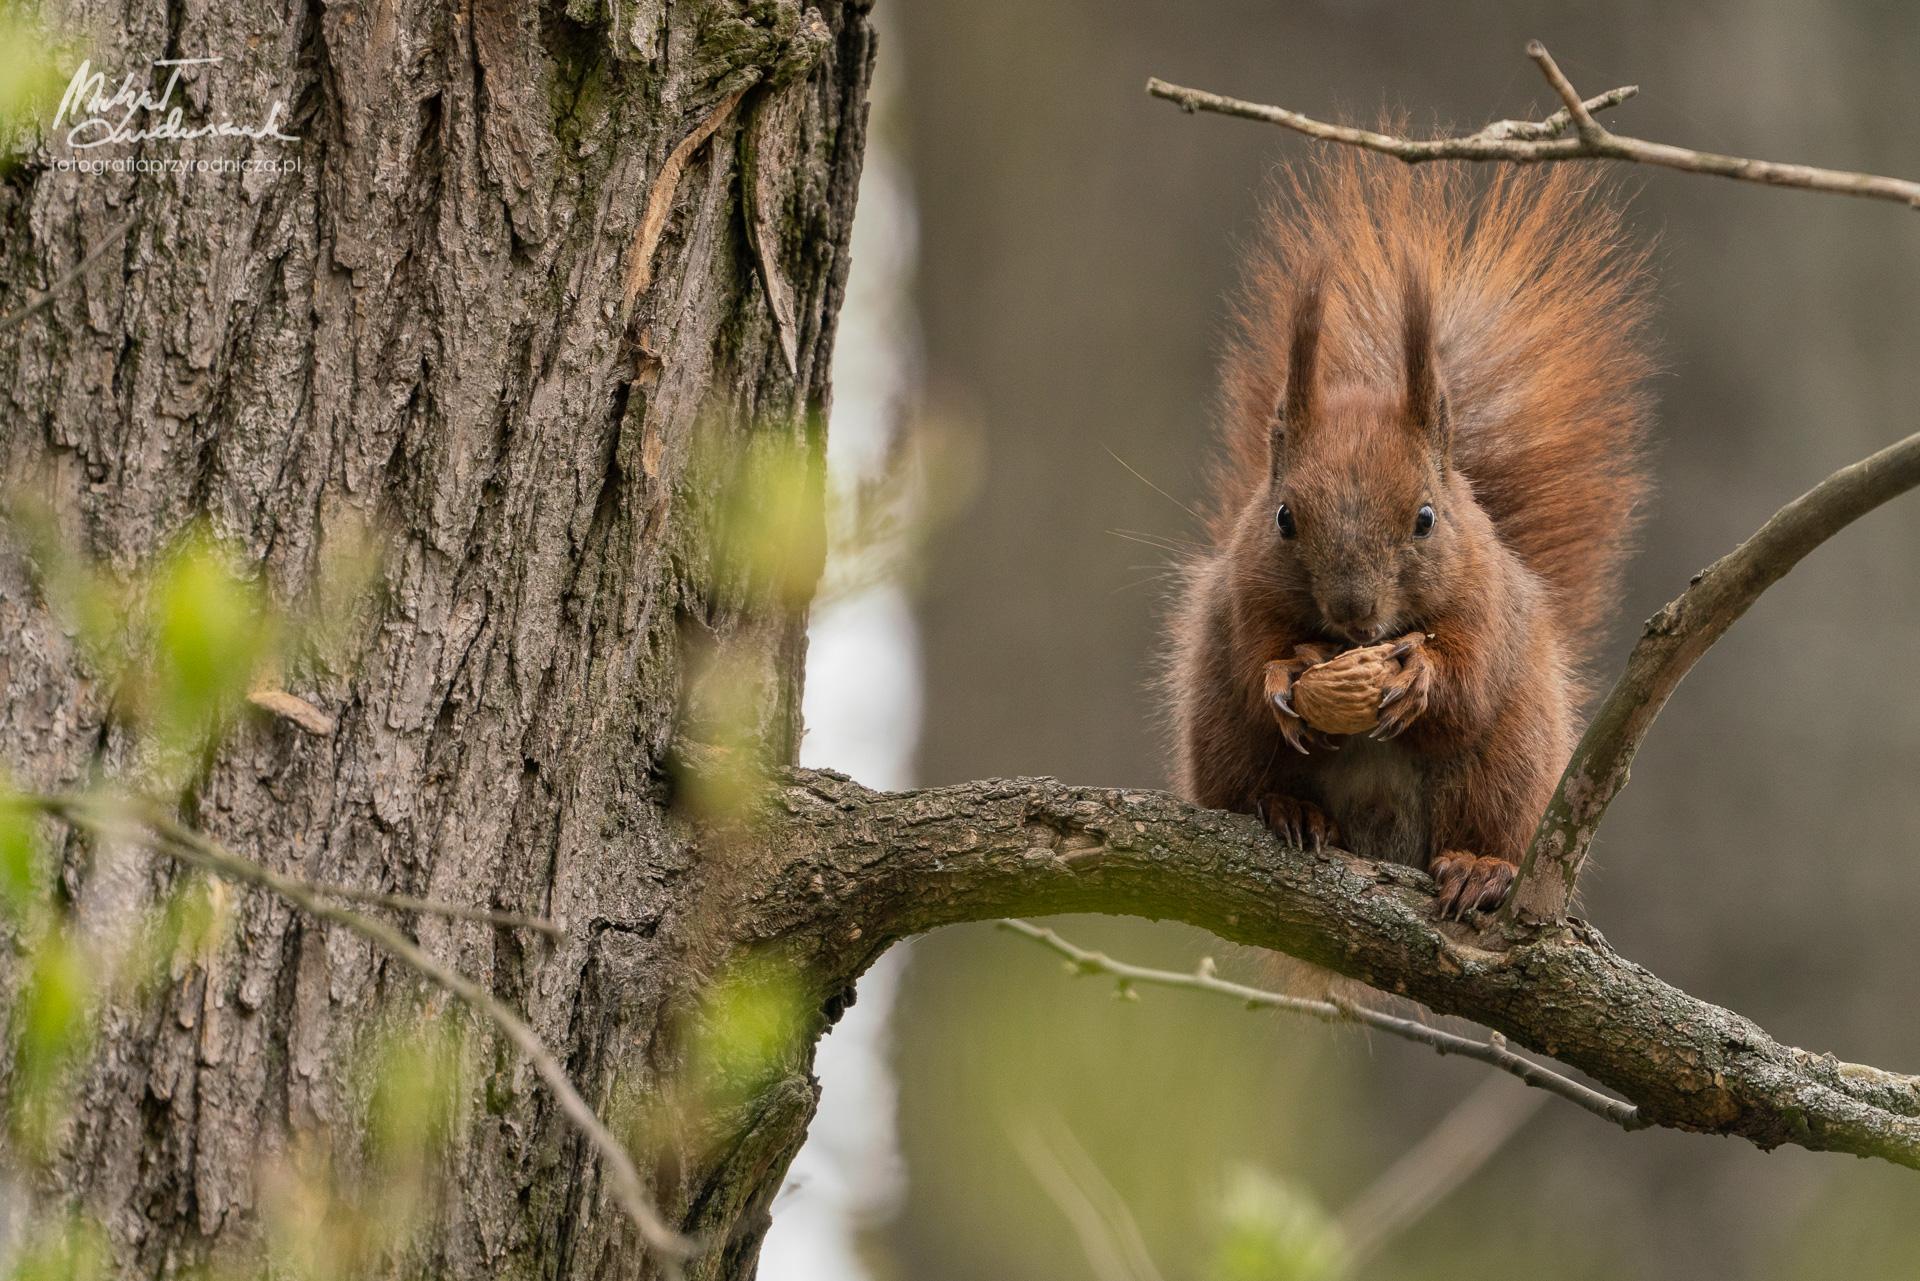 Wiewiórka je orzecha